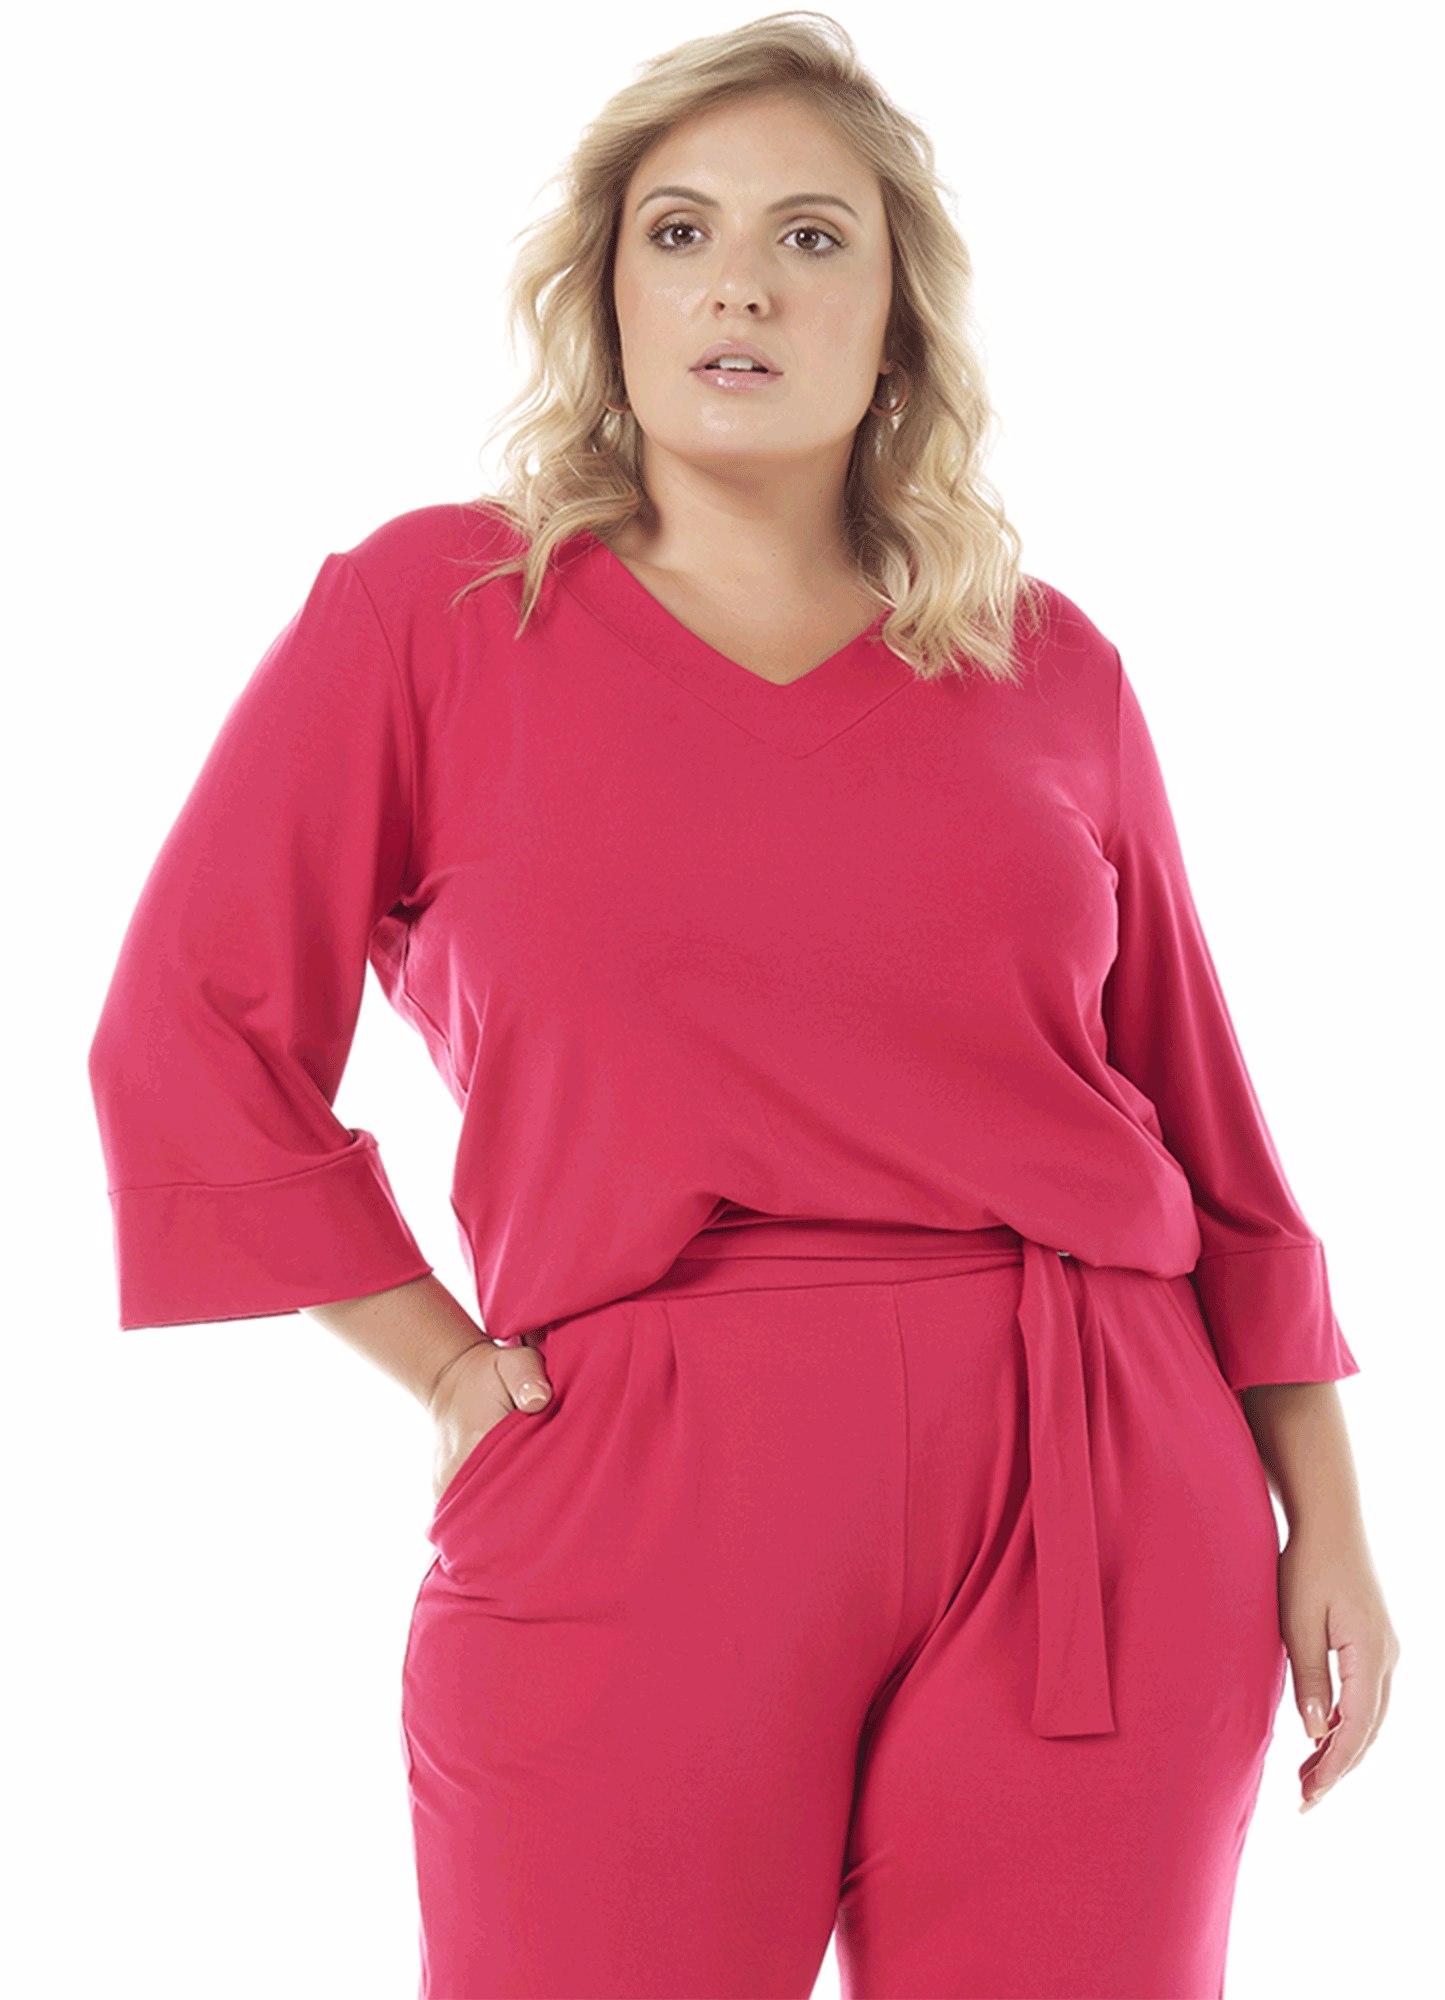 Blusa Feminina Viscose Pink Decote V Slim